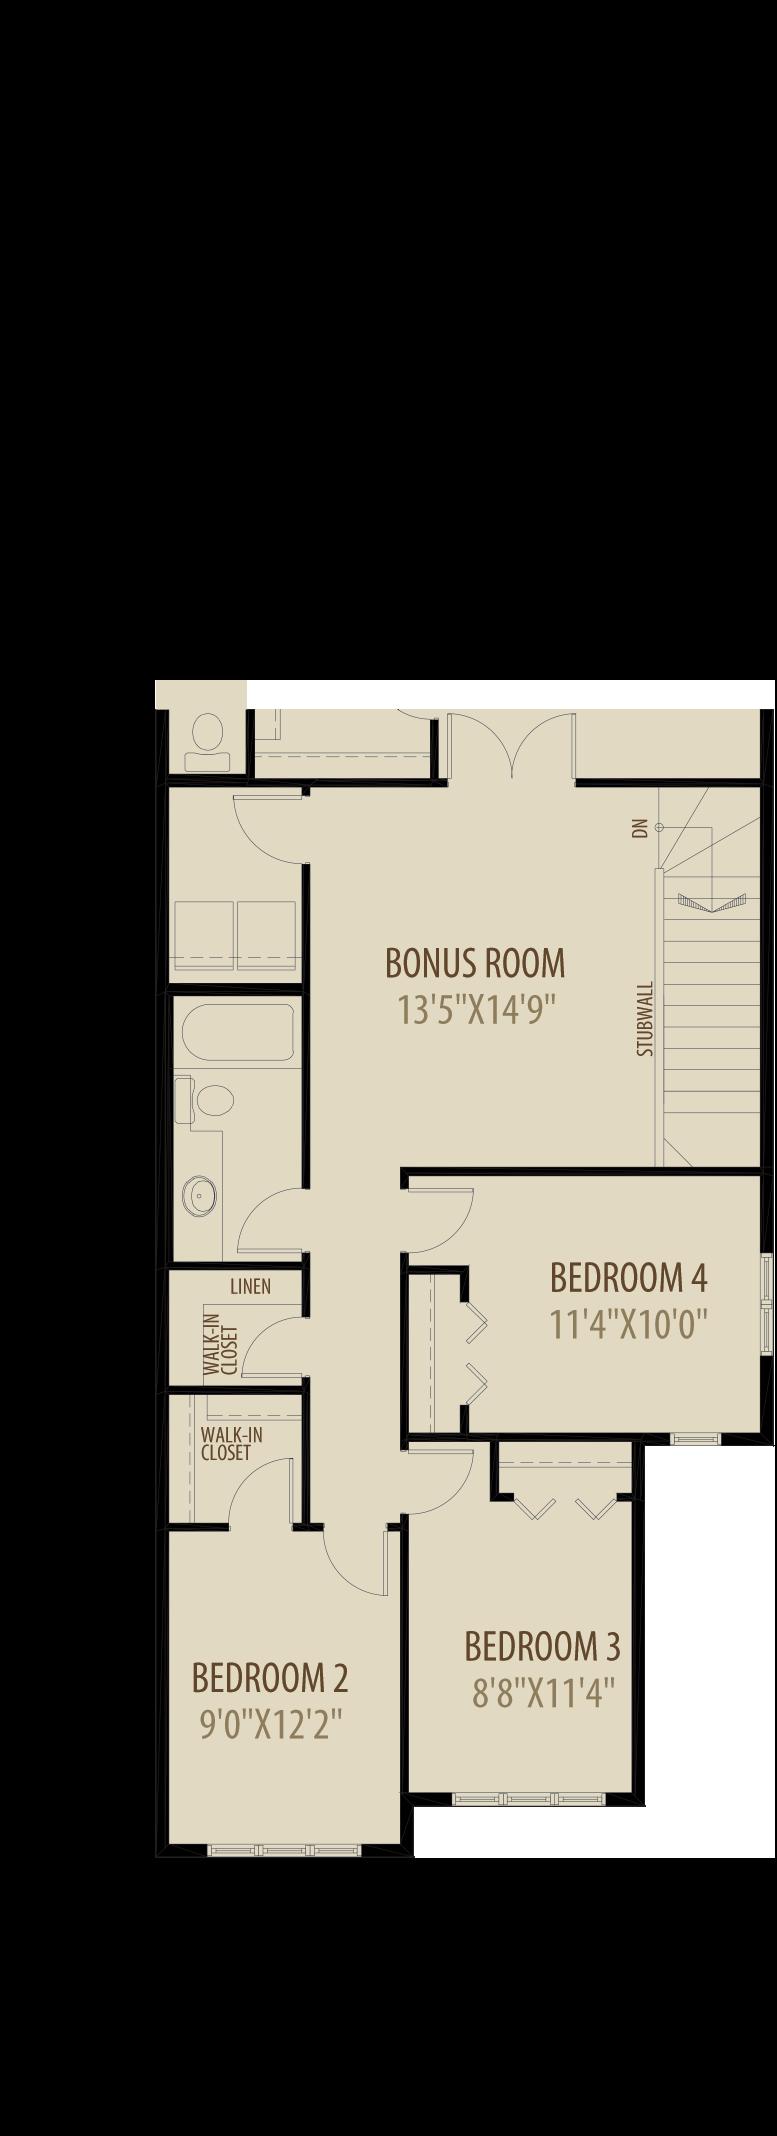 Option 3 Revised Upper Floor Adds 229Sq Ft